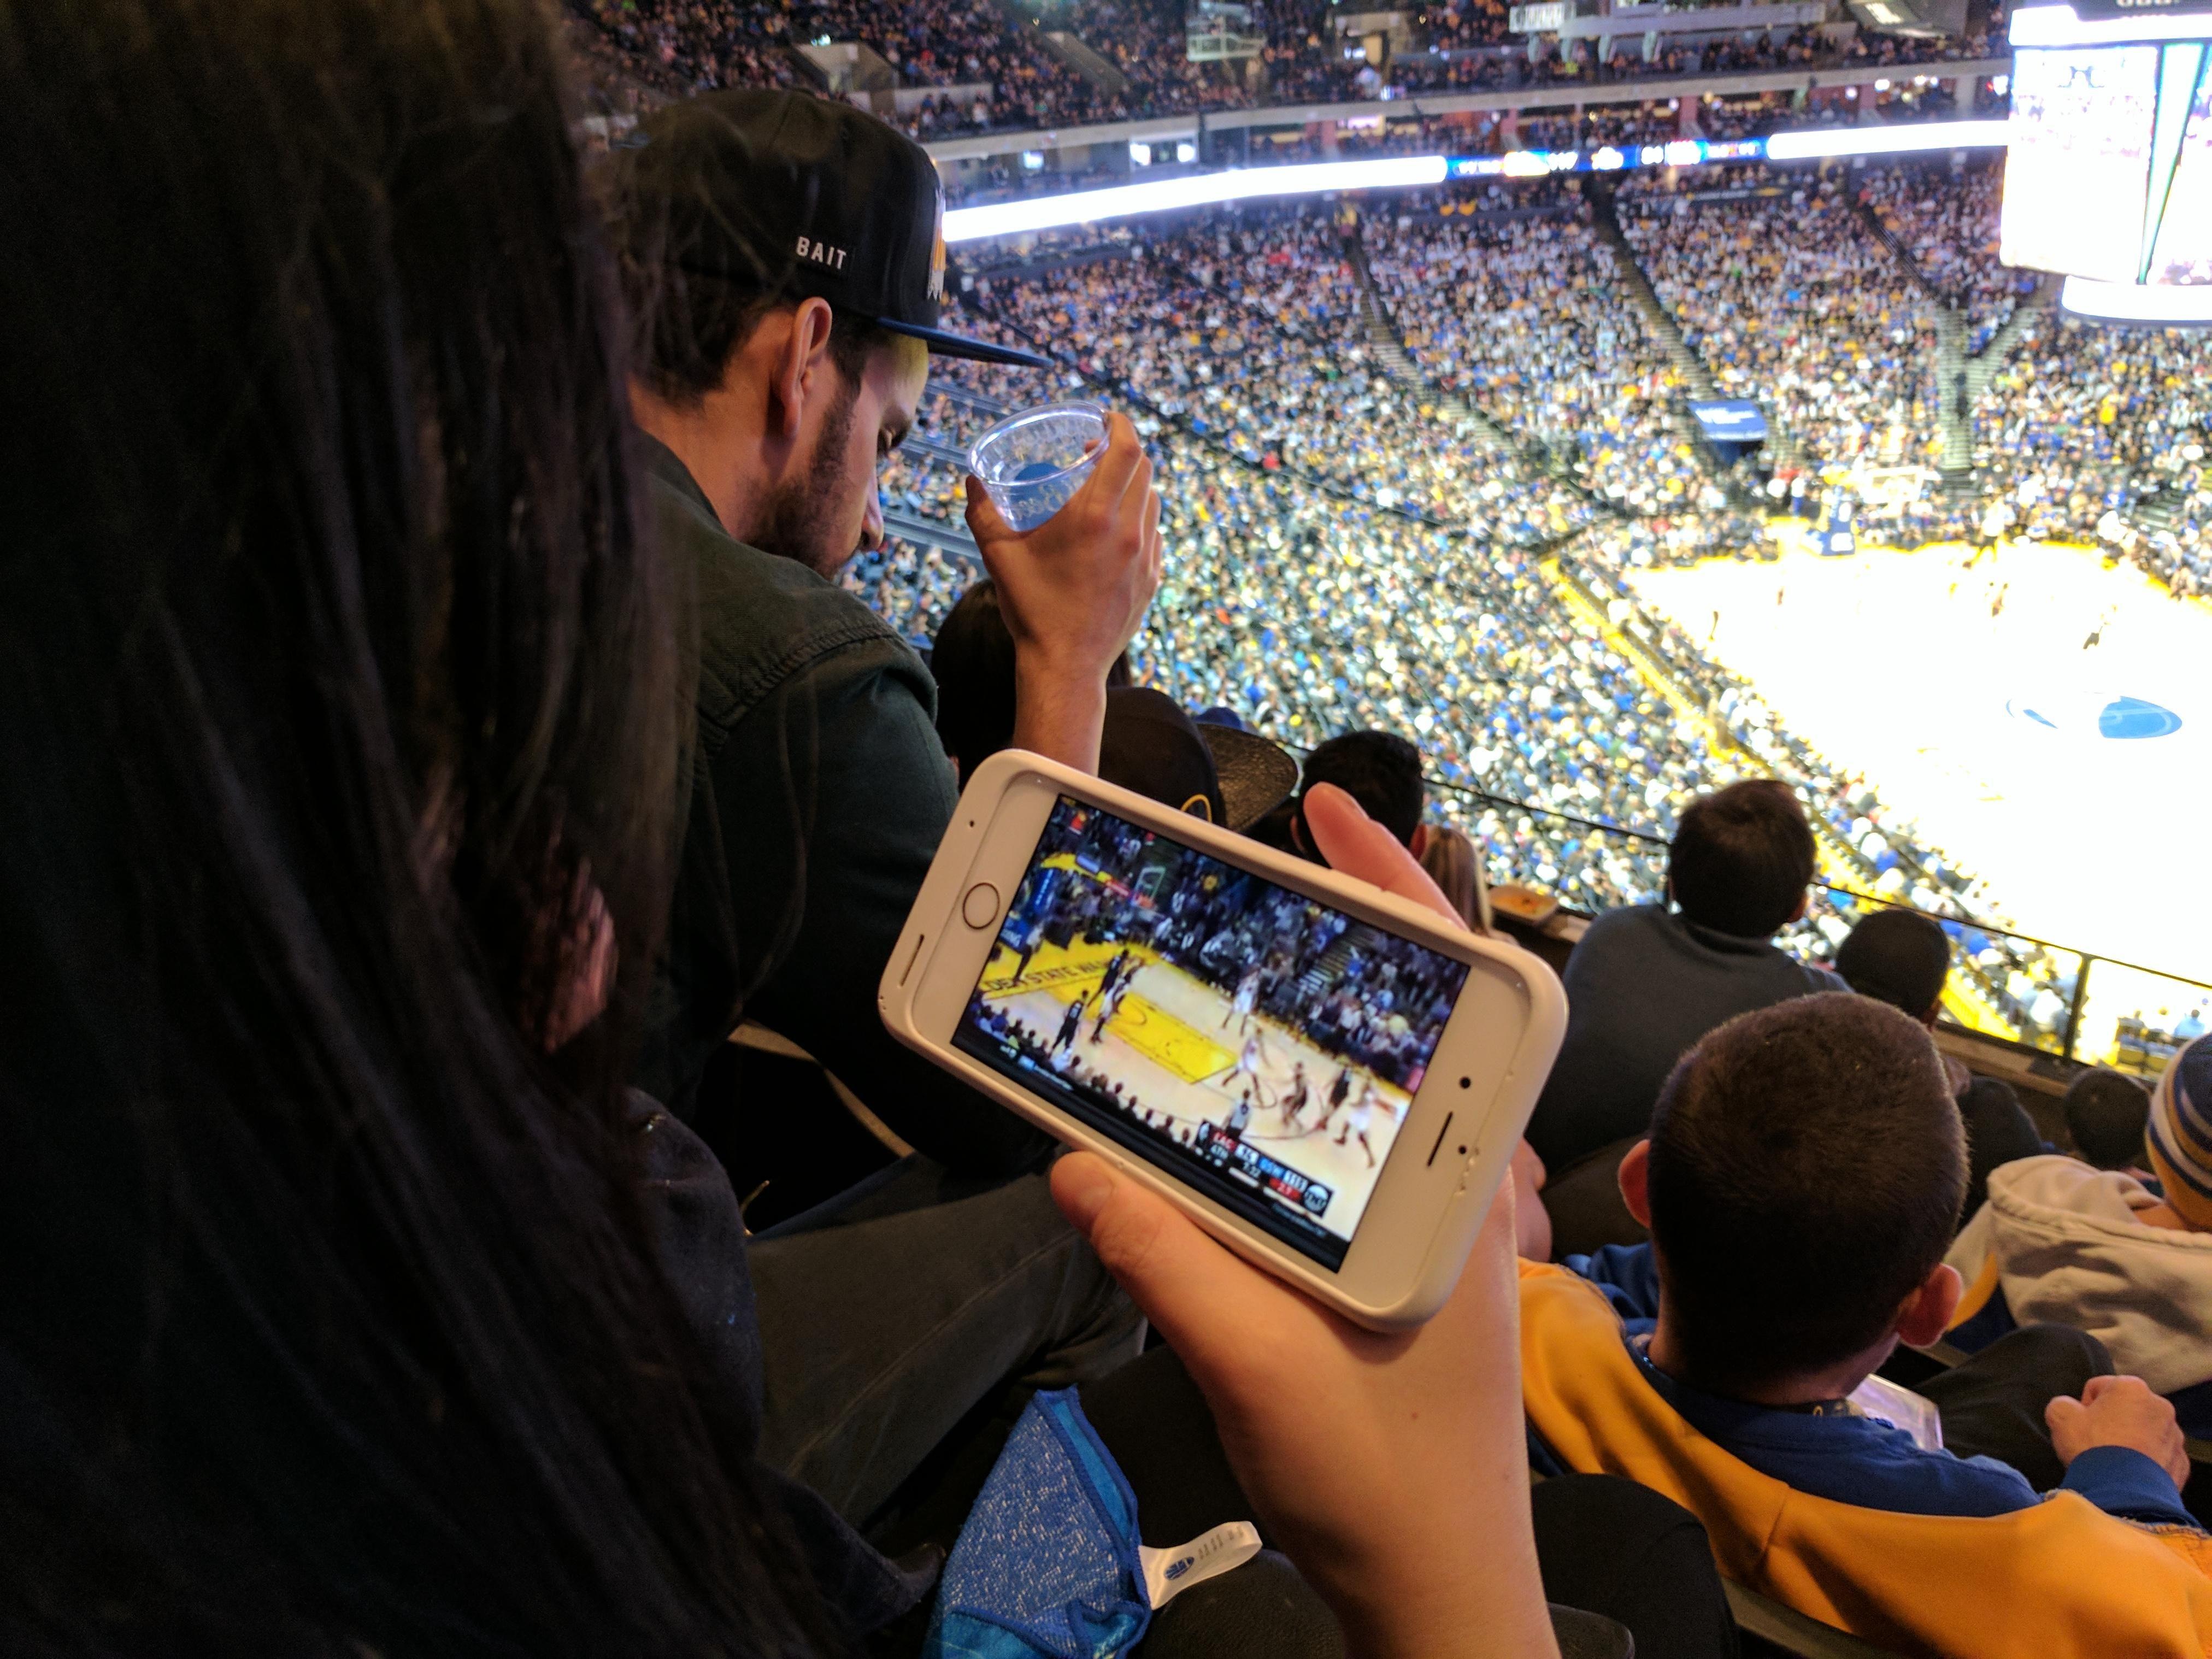 My girlfriend enjoying her view at the Warriors game; worth $125.